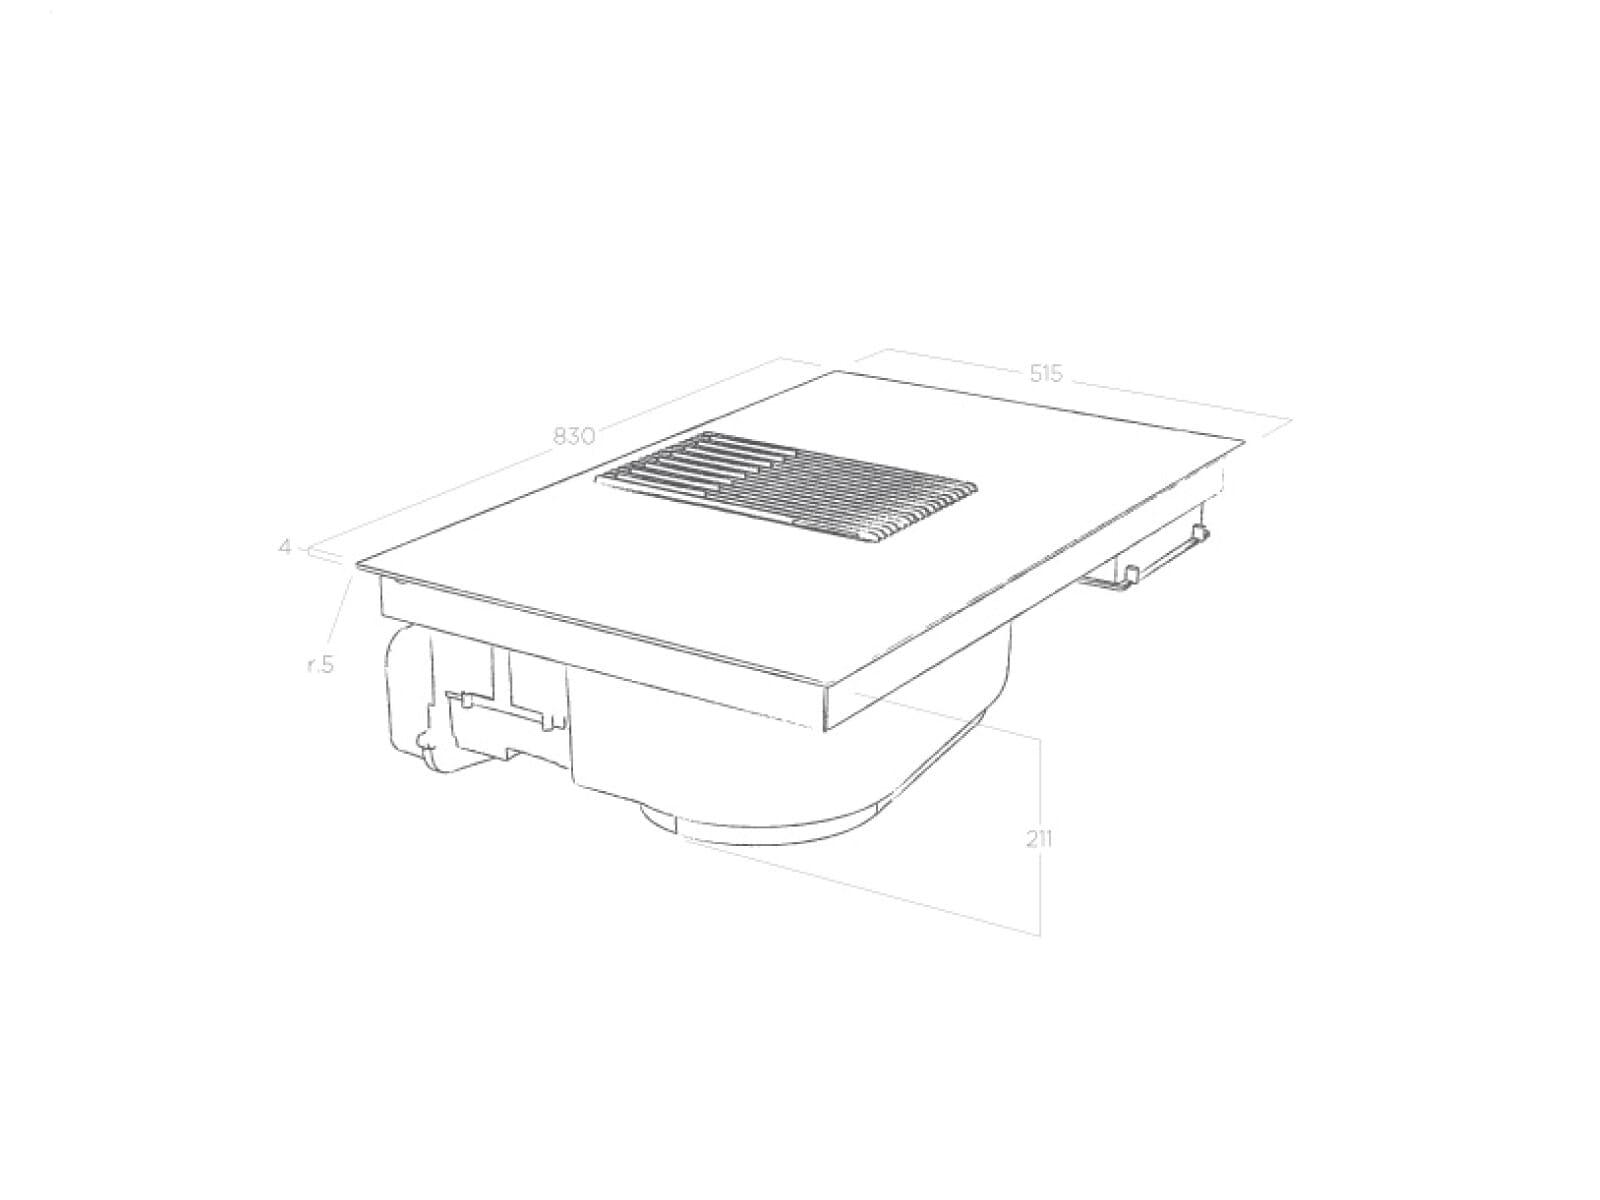 Elica NikolaTesla Libra PRF0147775A Induktionskochfeld-Dunstabzug-Kombination Weiß mit integrierter Waage